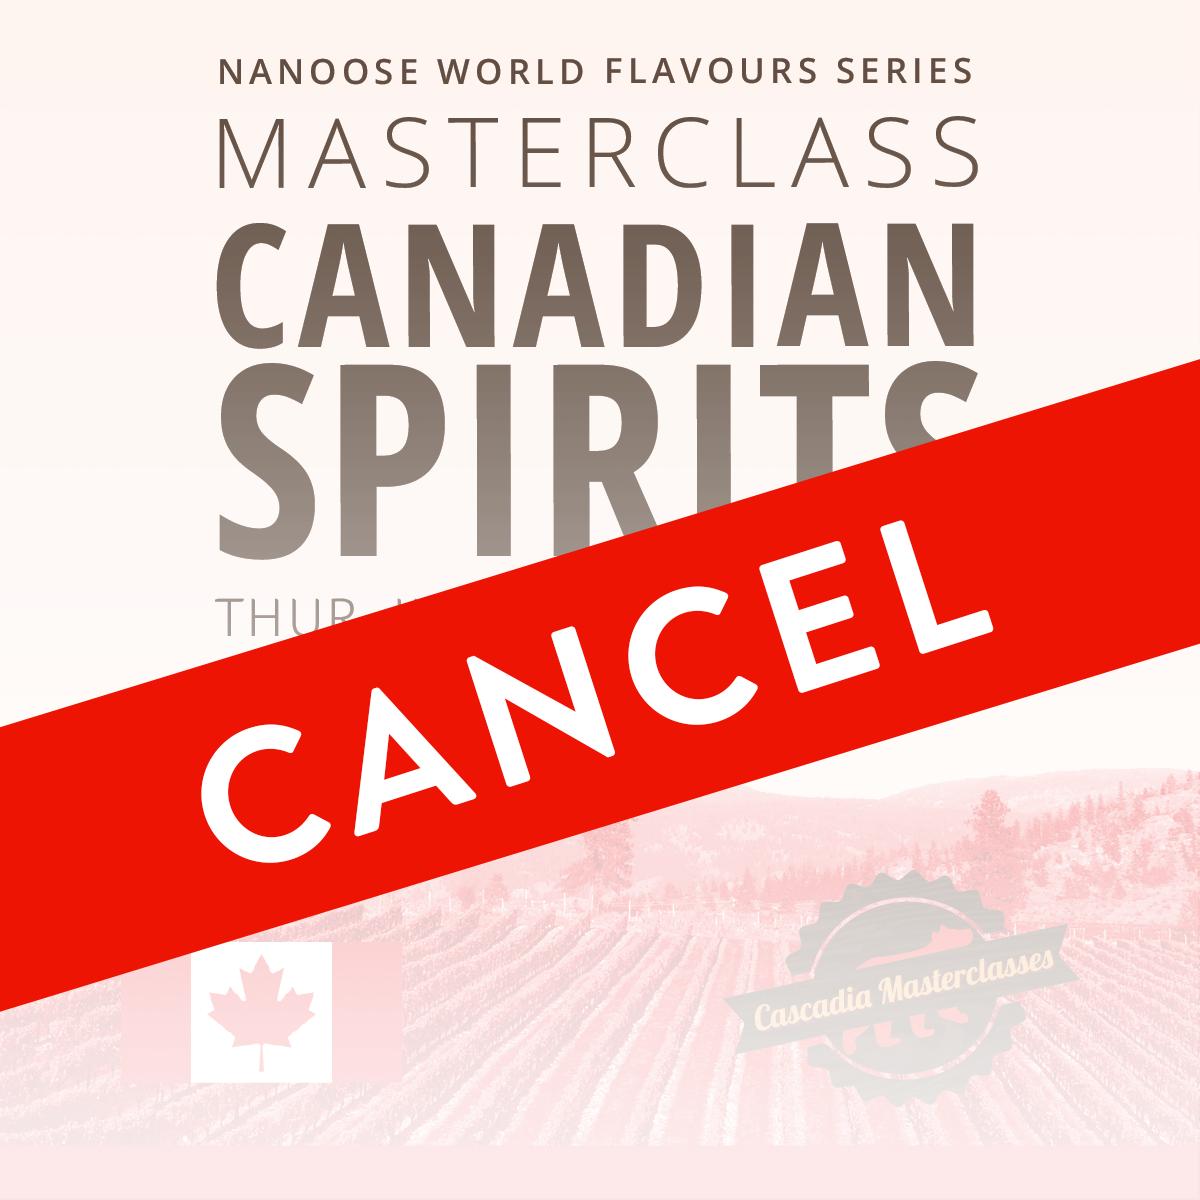 Cascadia Nanoose Masterclass_June 20_Web_Cancel.png